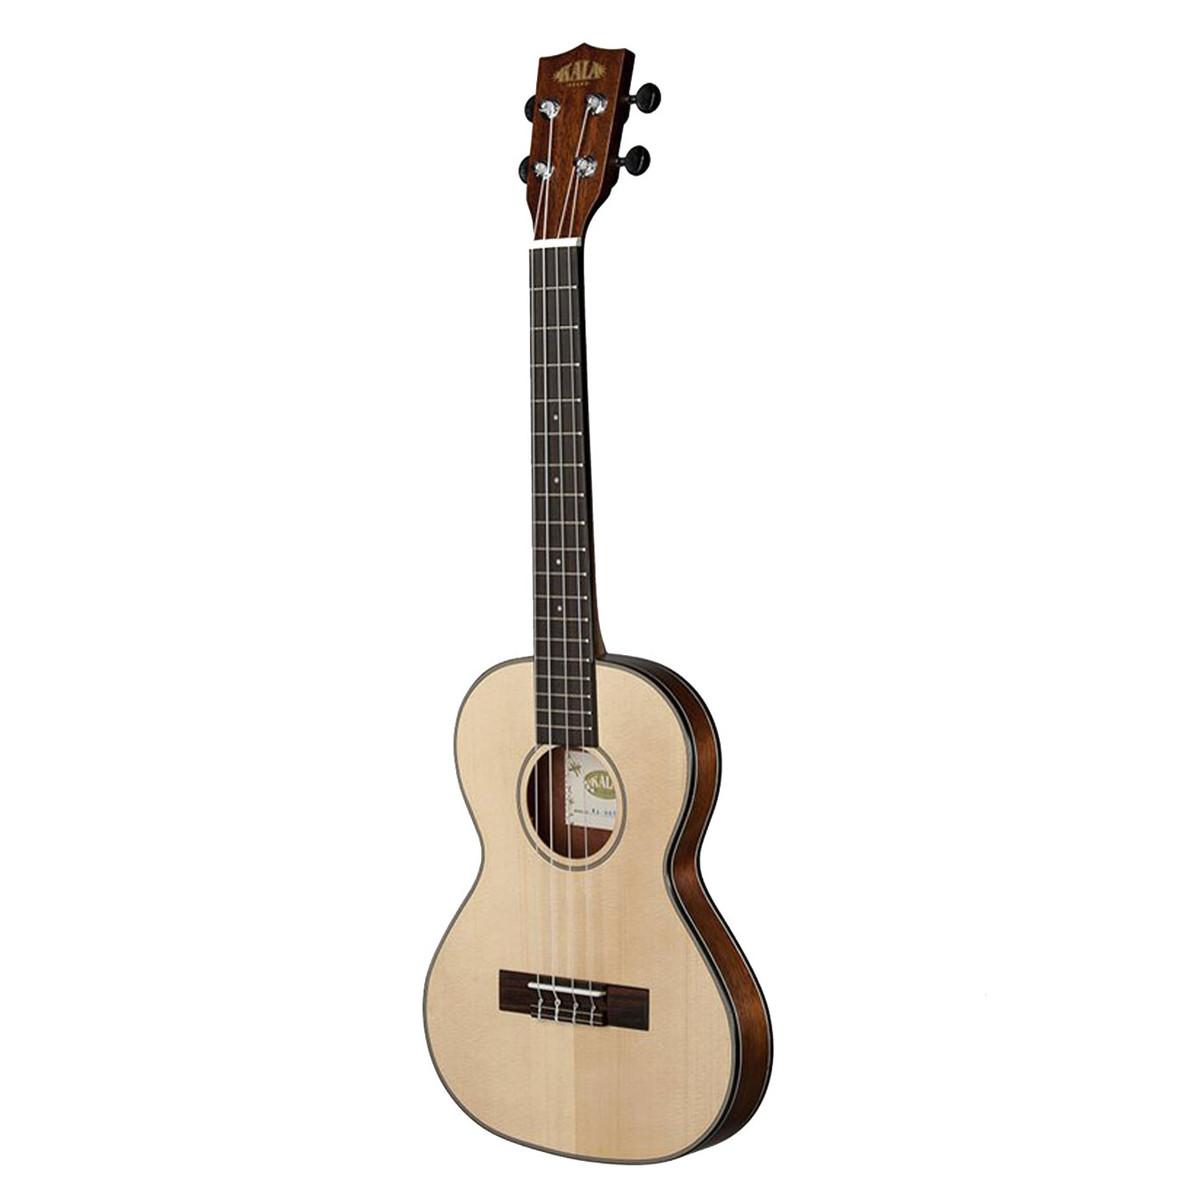 kala ka sstu t thinline reisen tenor ukulele mit tasche. Black Bedroom Furniture Sets. Home Design Ideas